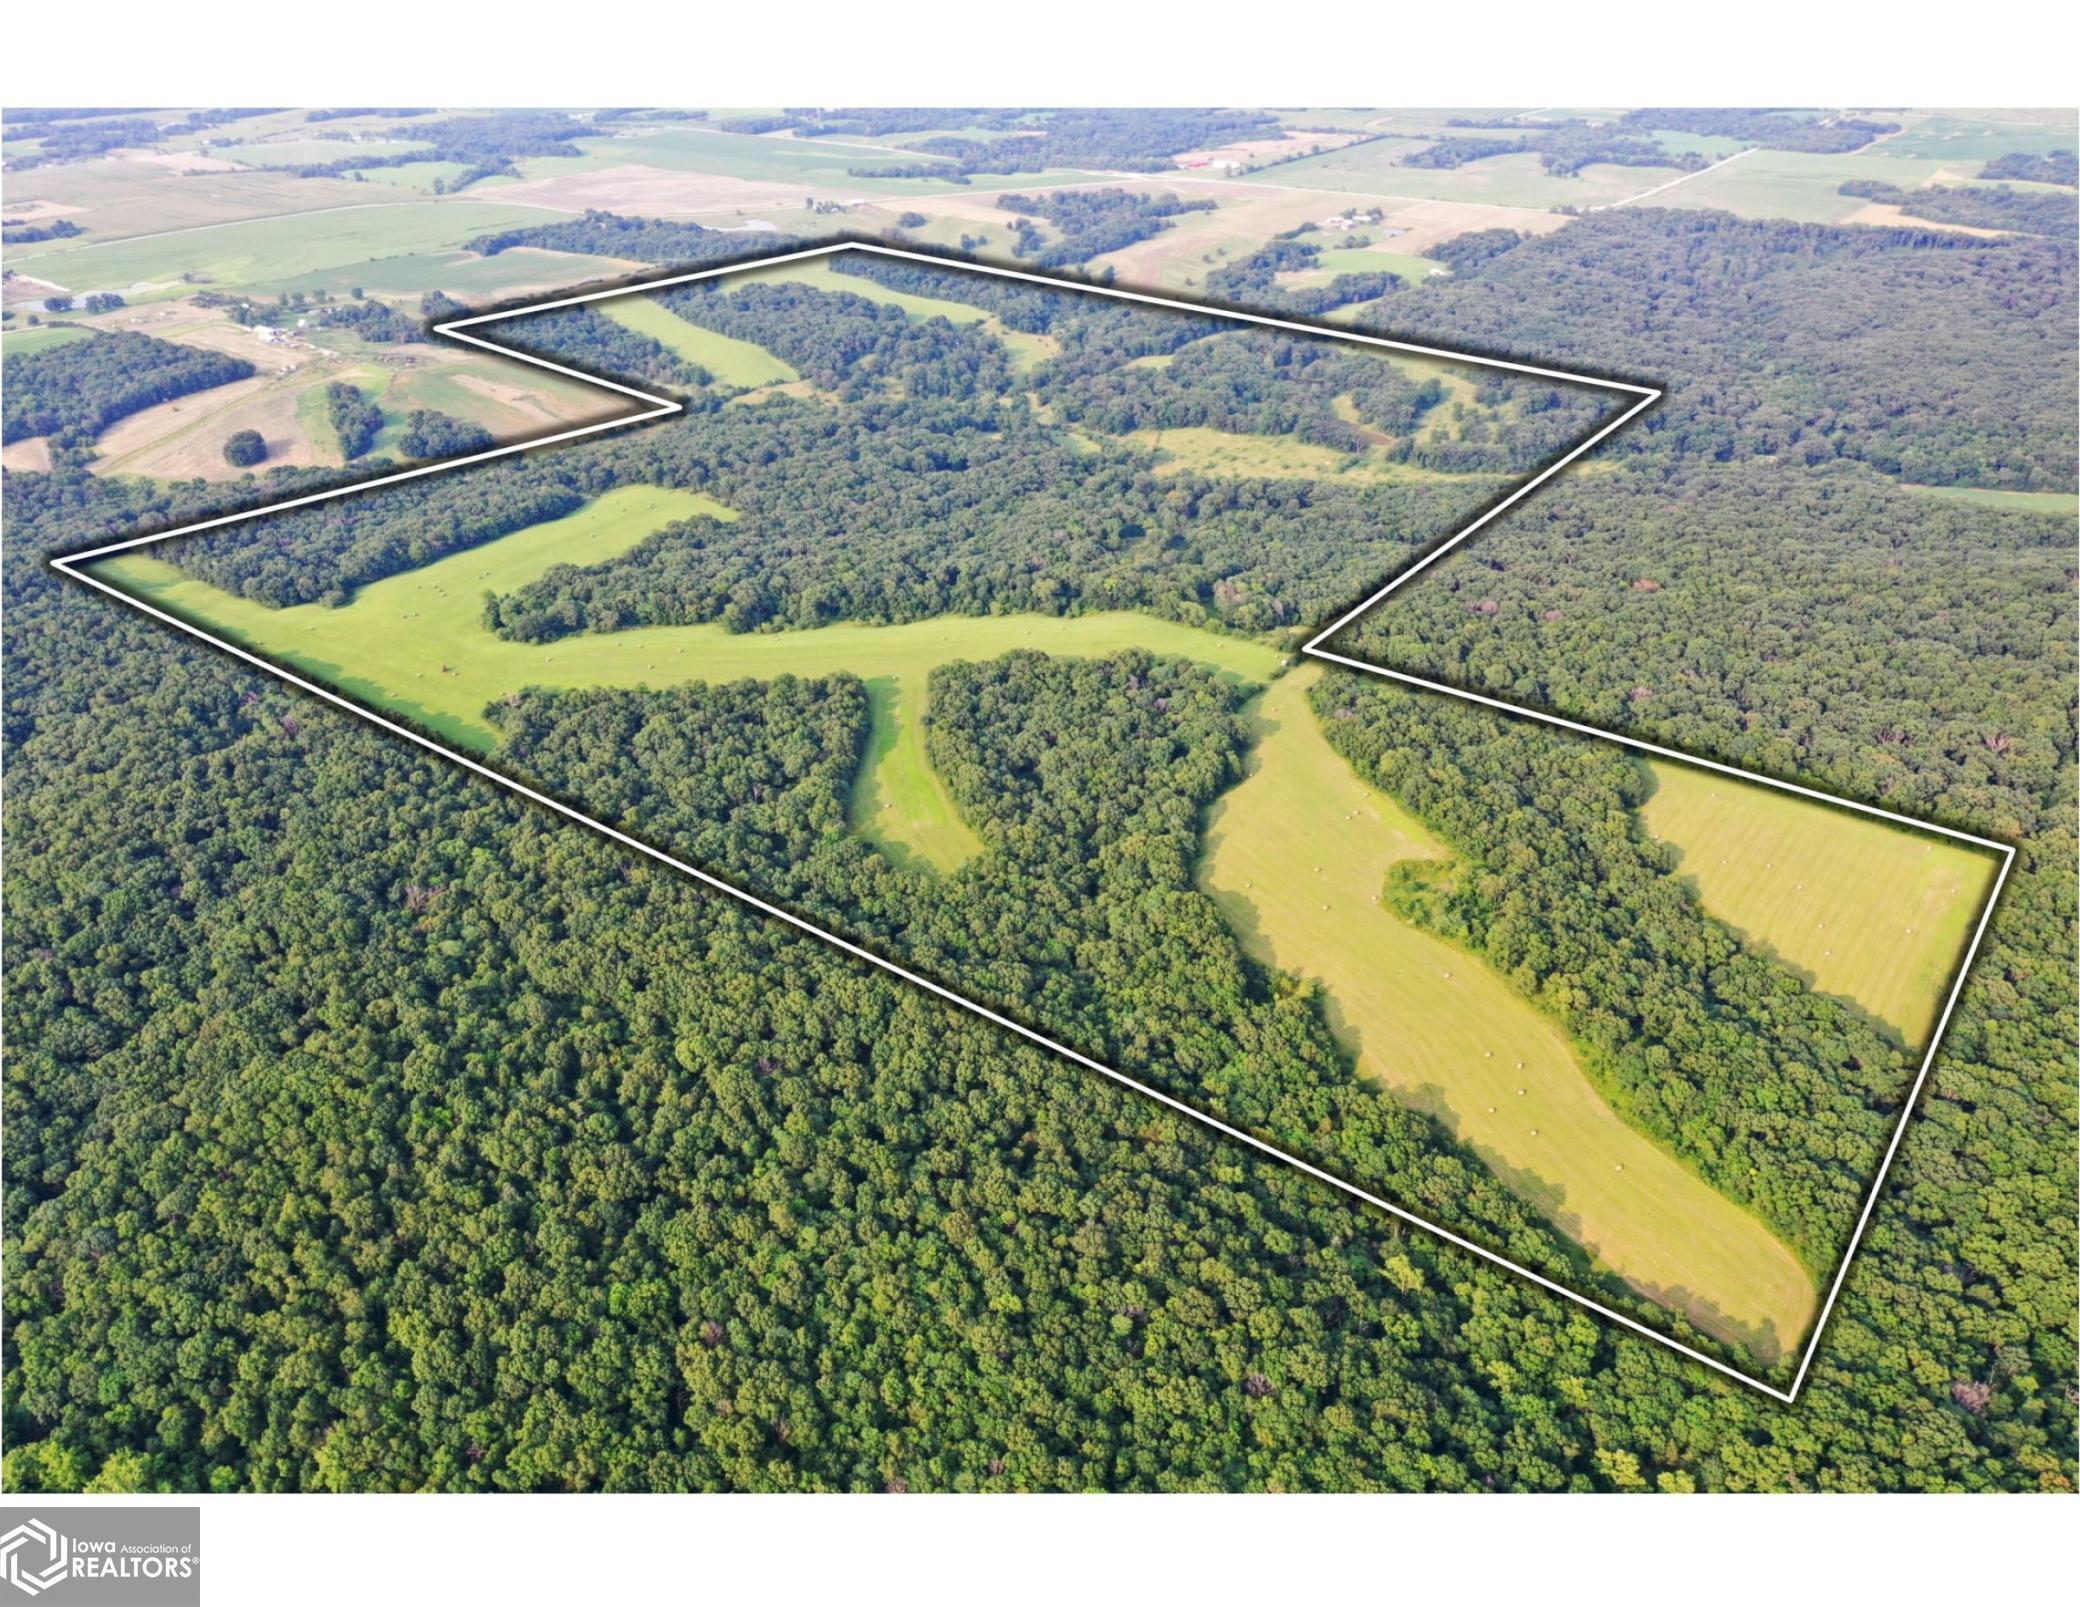 01-15649-photo-lee-county-iowa-340-acres-listing-number-15649-0-2021-07-21-184233jpg